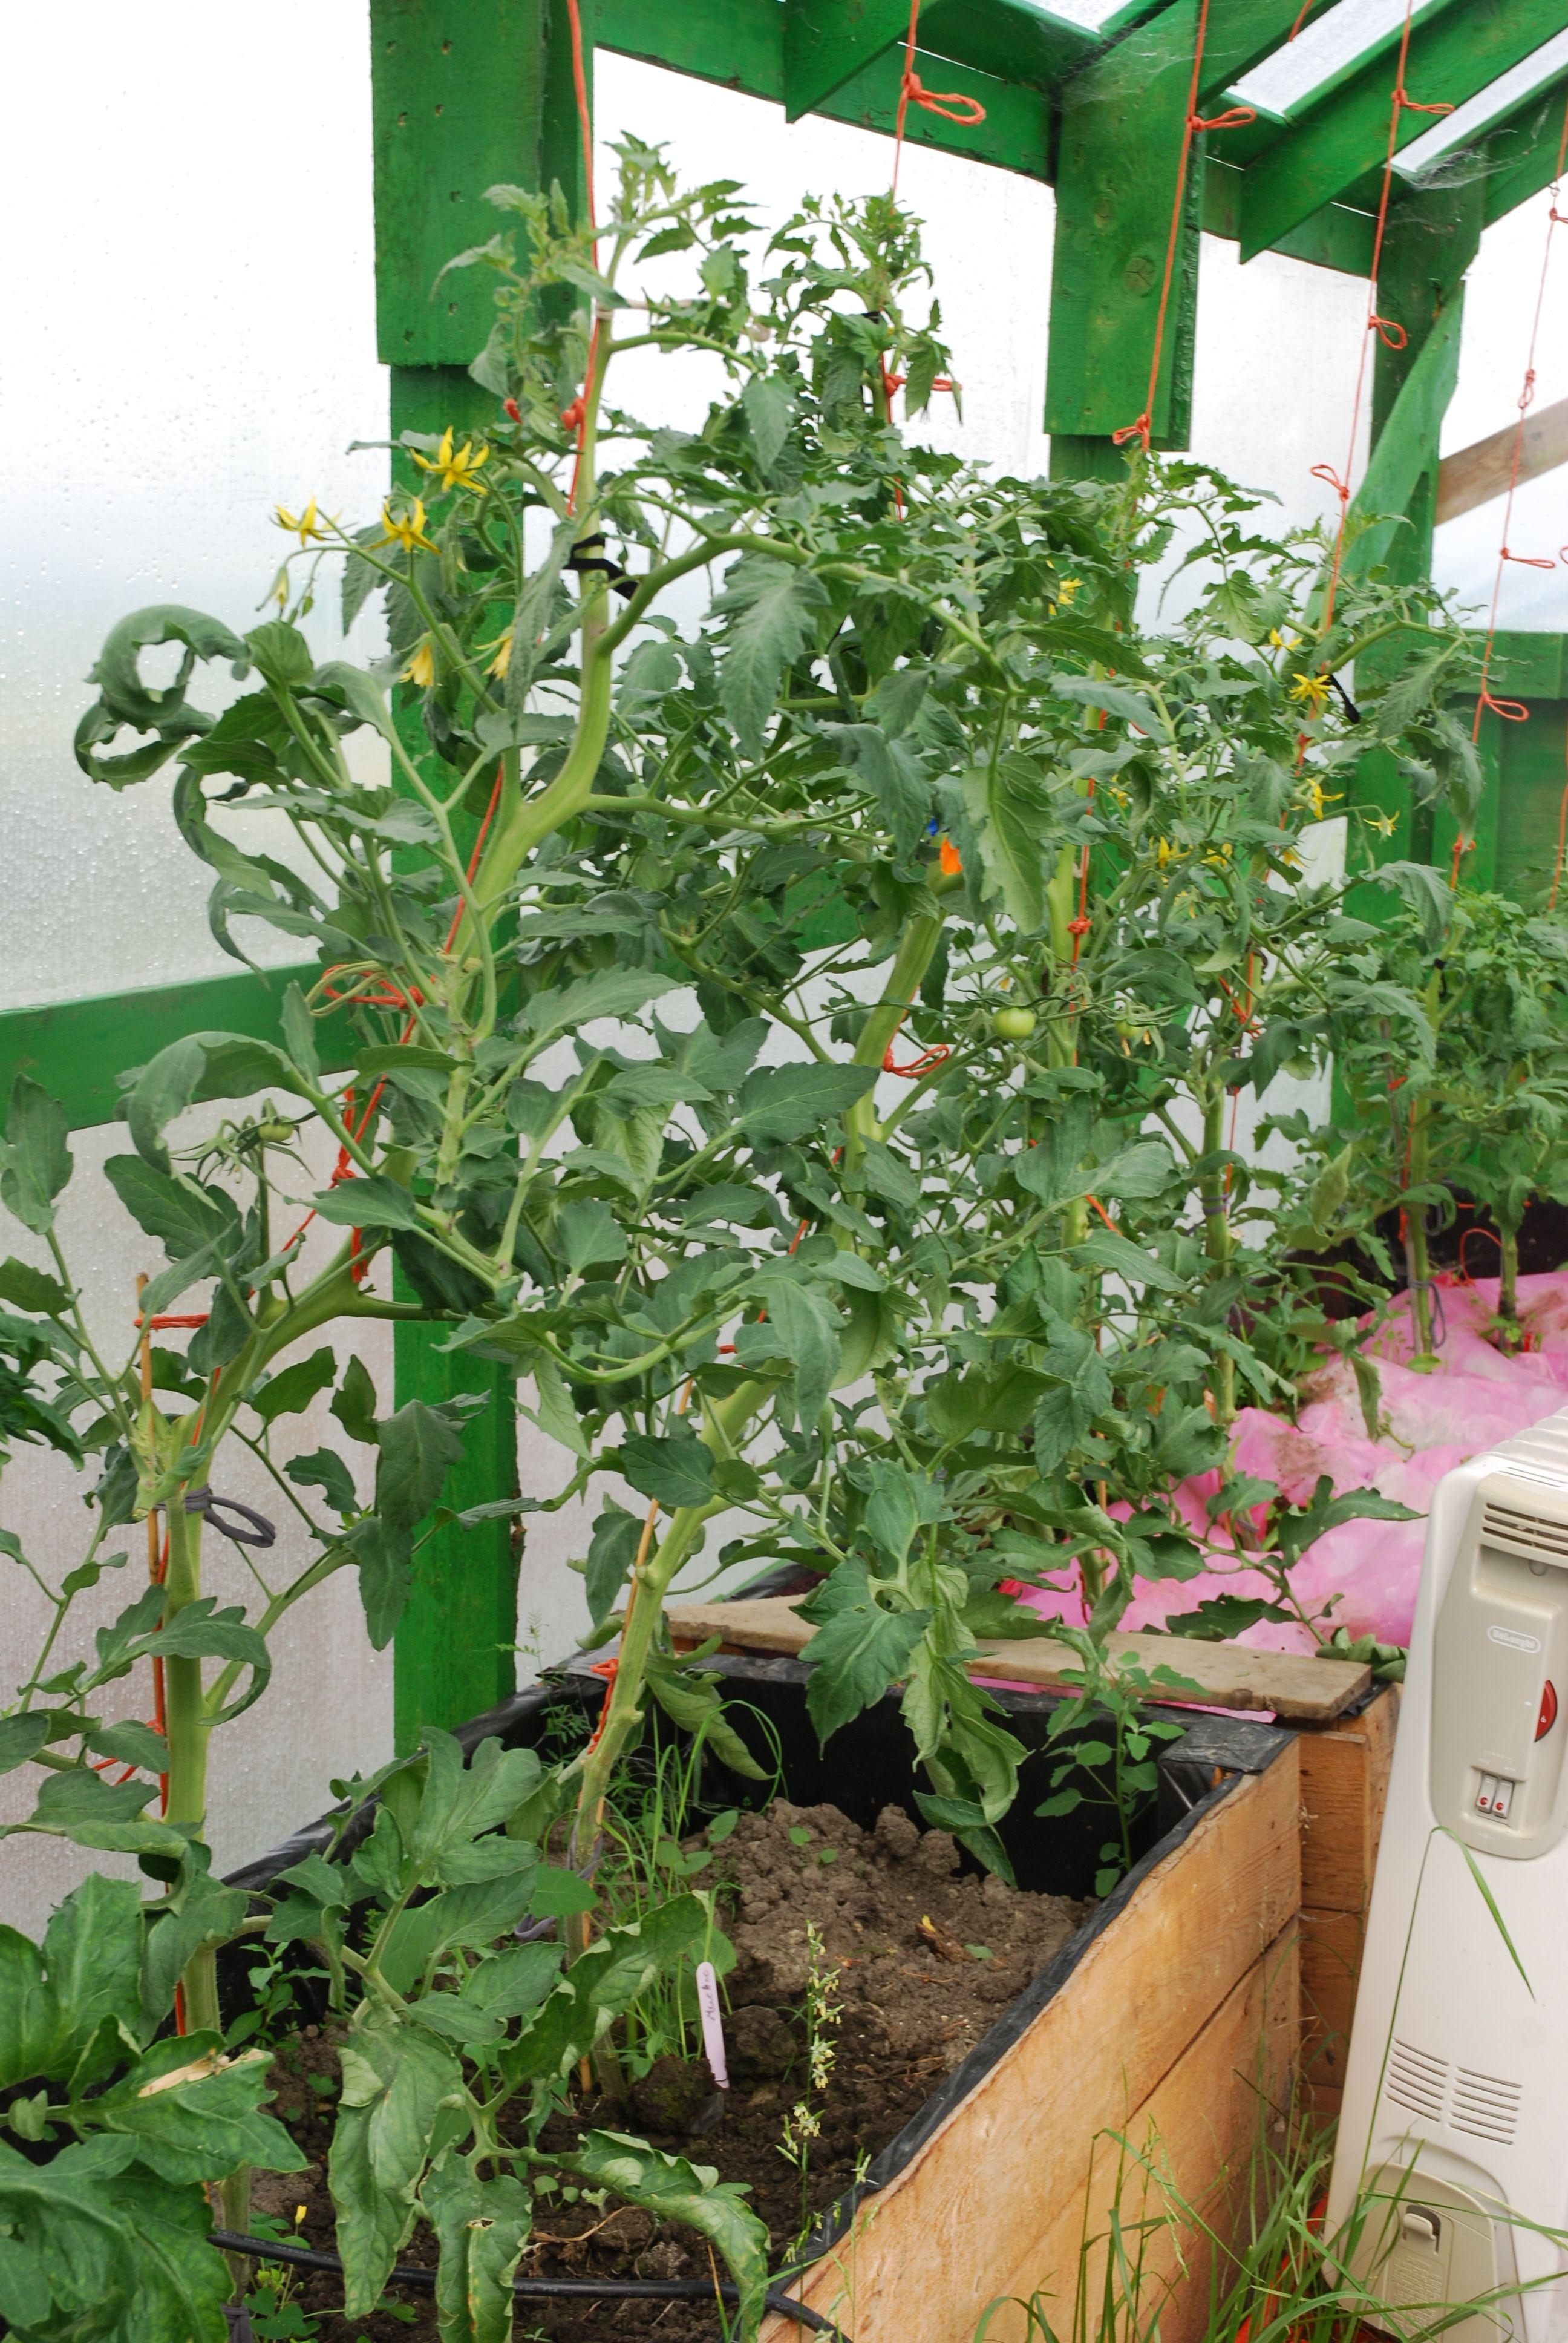 Plant de tomate Muchoo rose de serre et de tomate trust